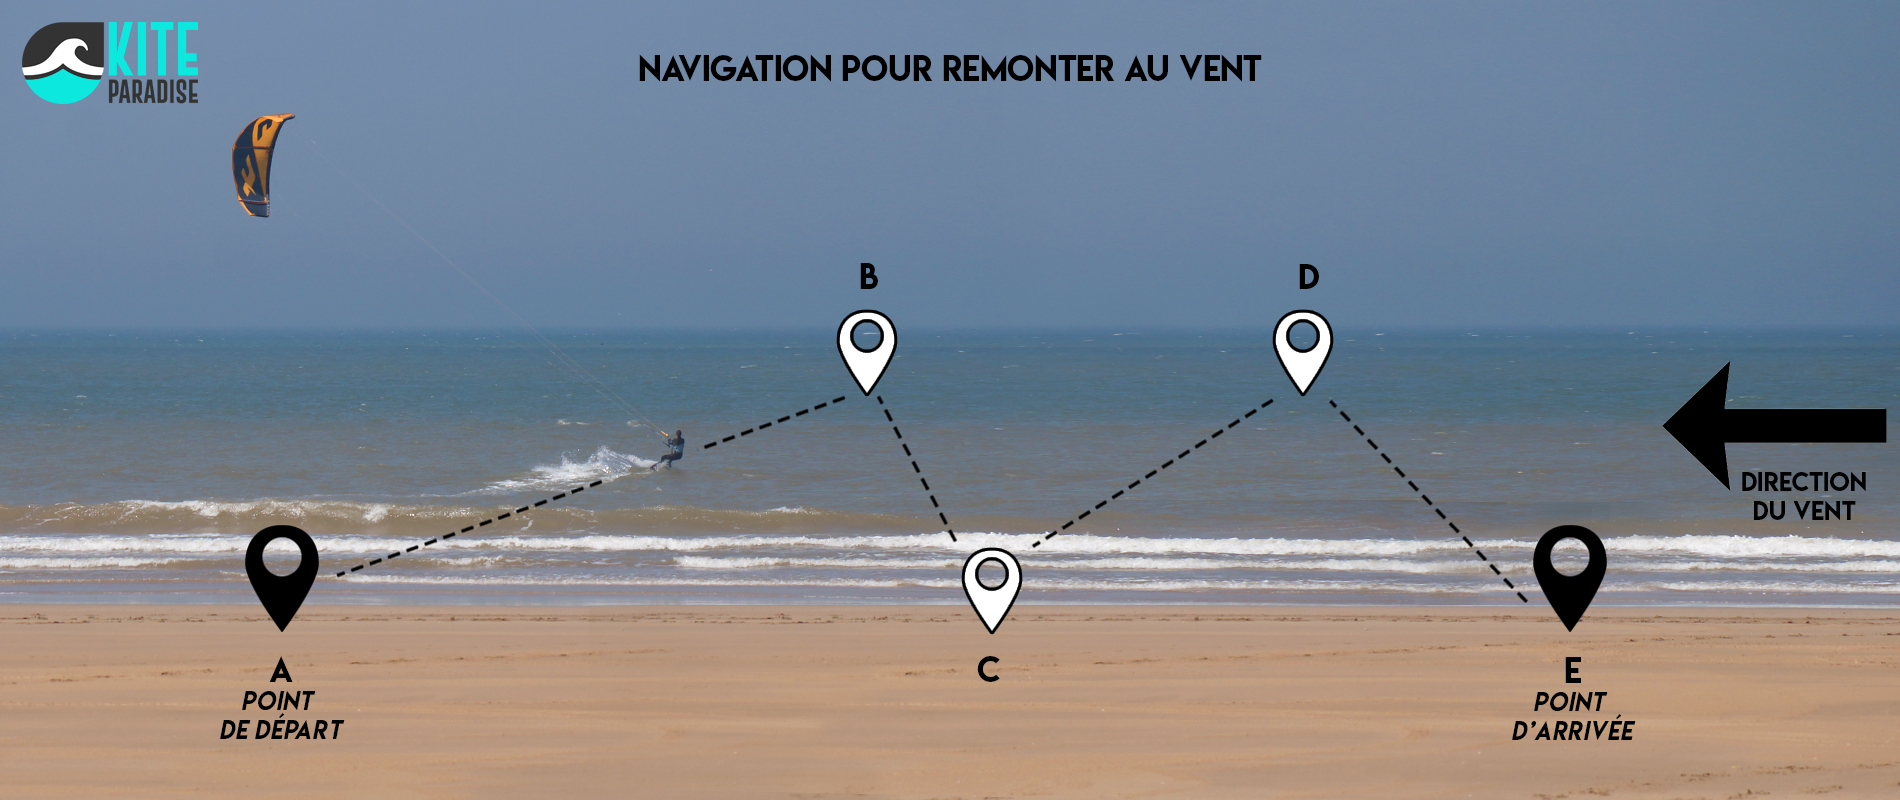 Kitesurf comment remonter au vent